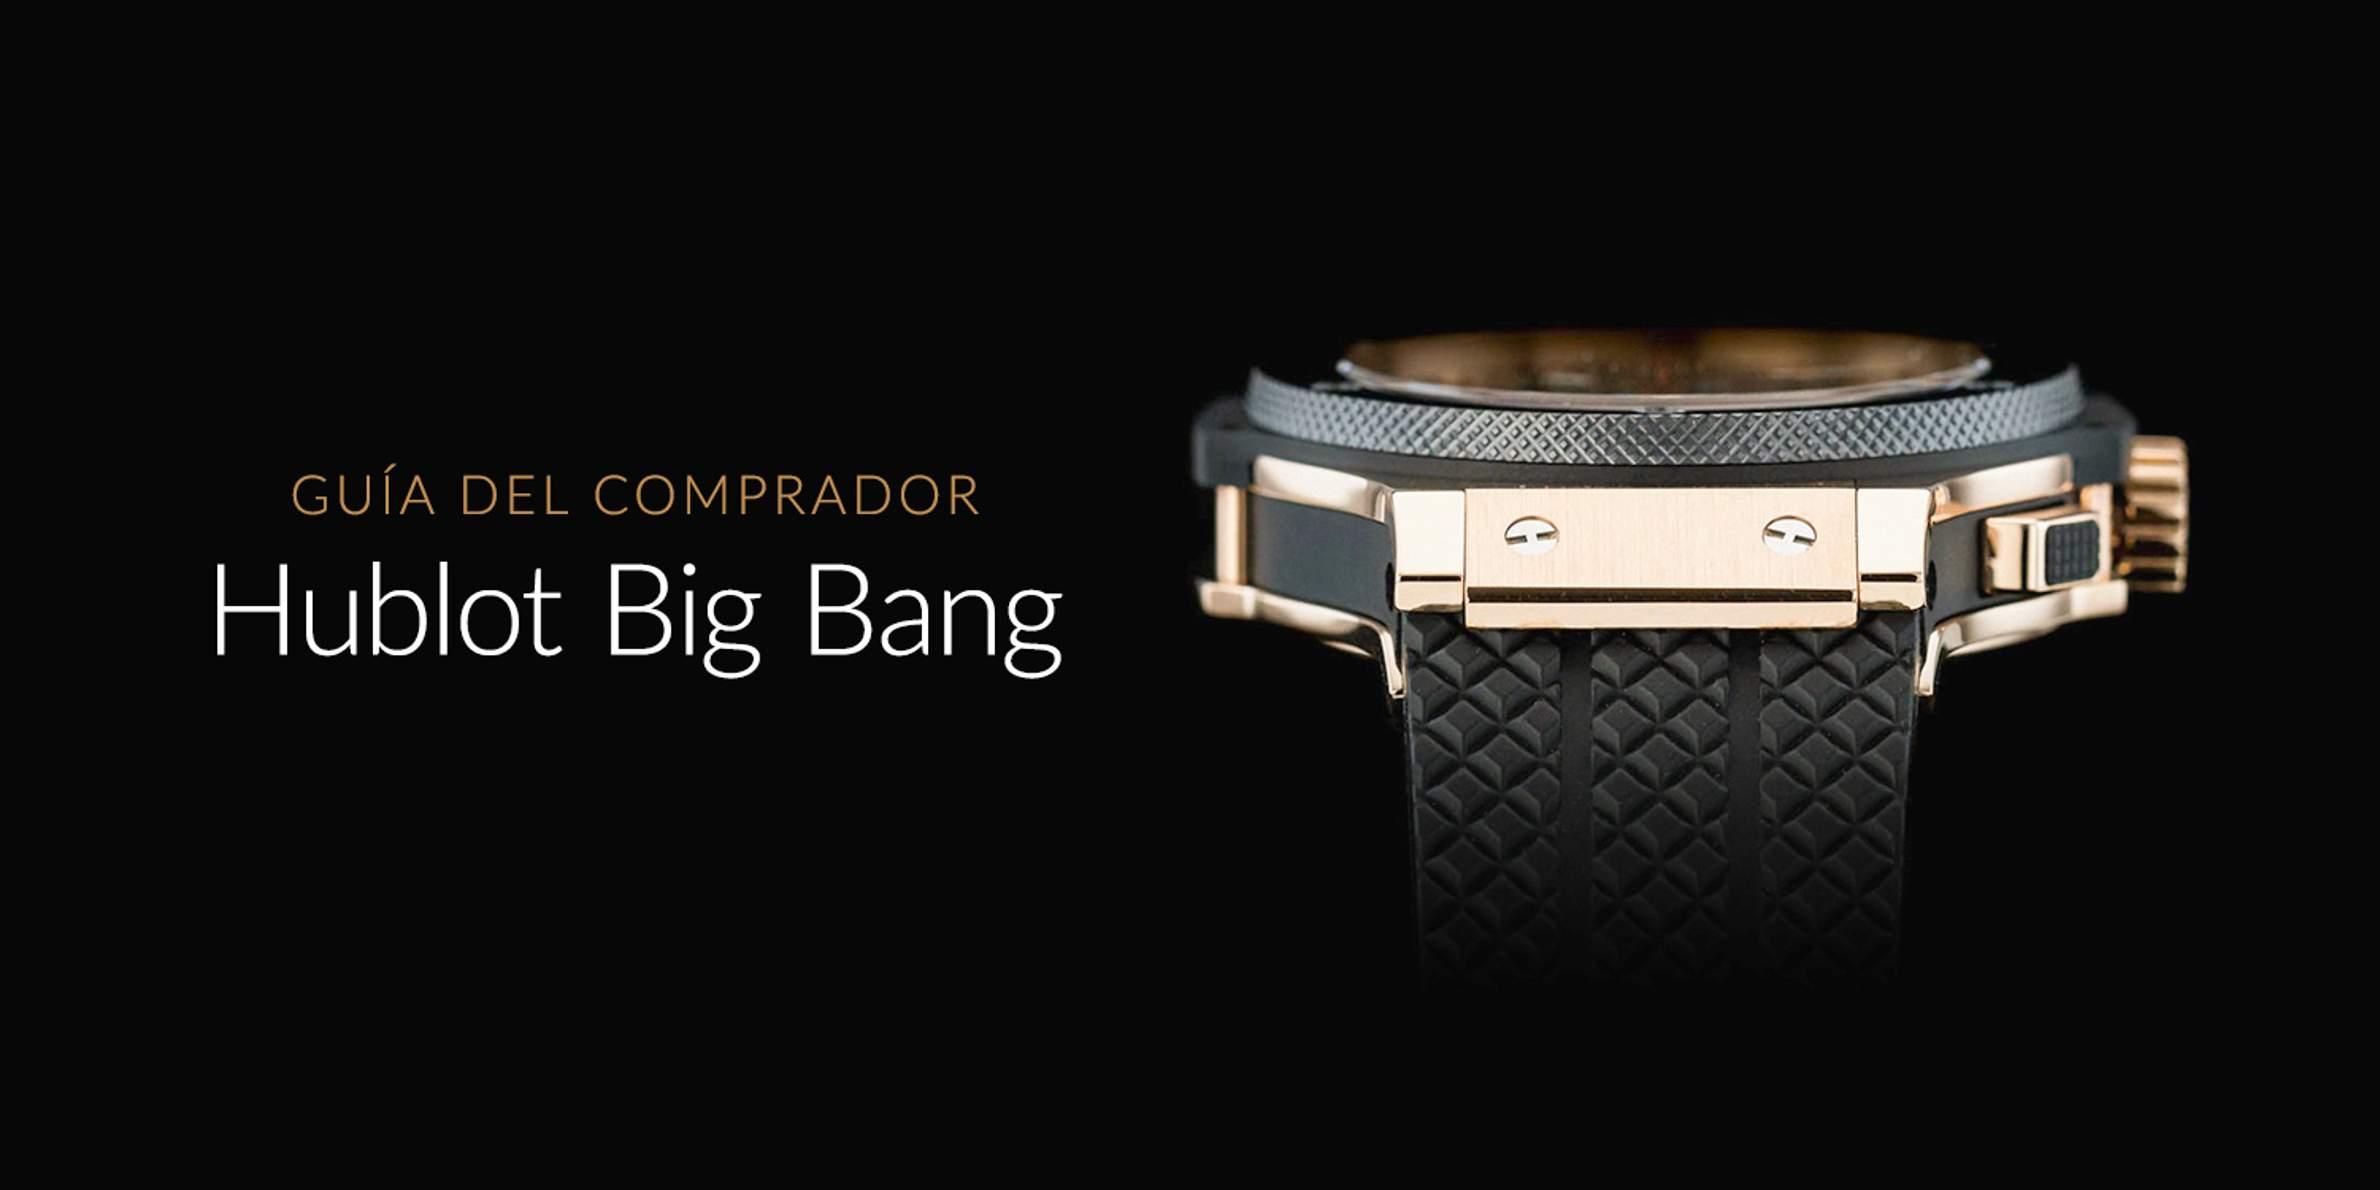 CAM-1709-Buyers-Guide-Hublot-Big-Bang-2-1-ES